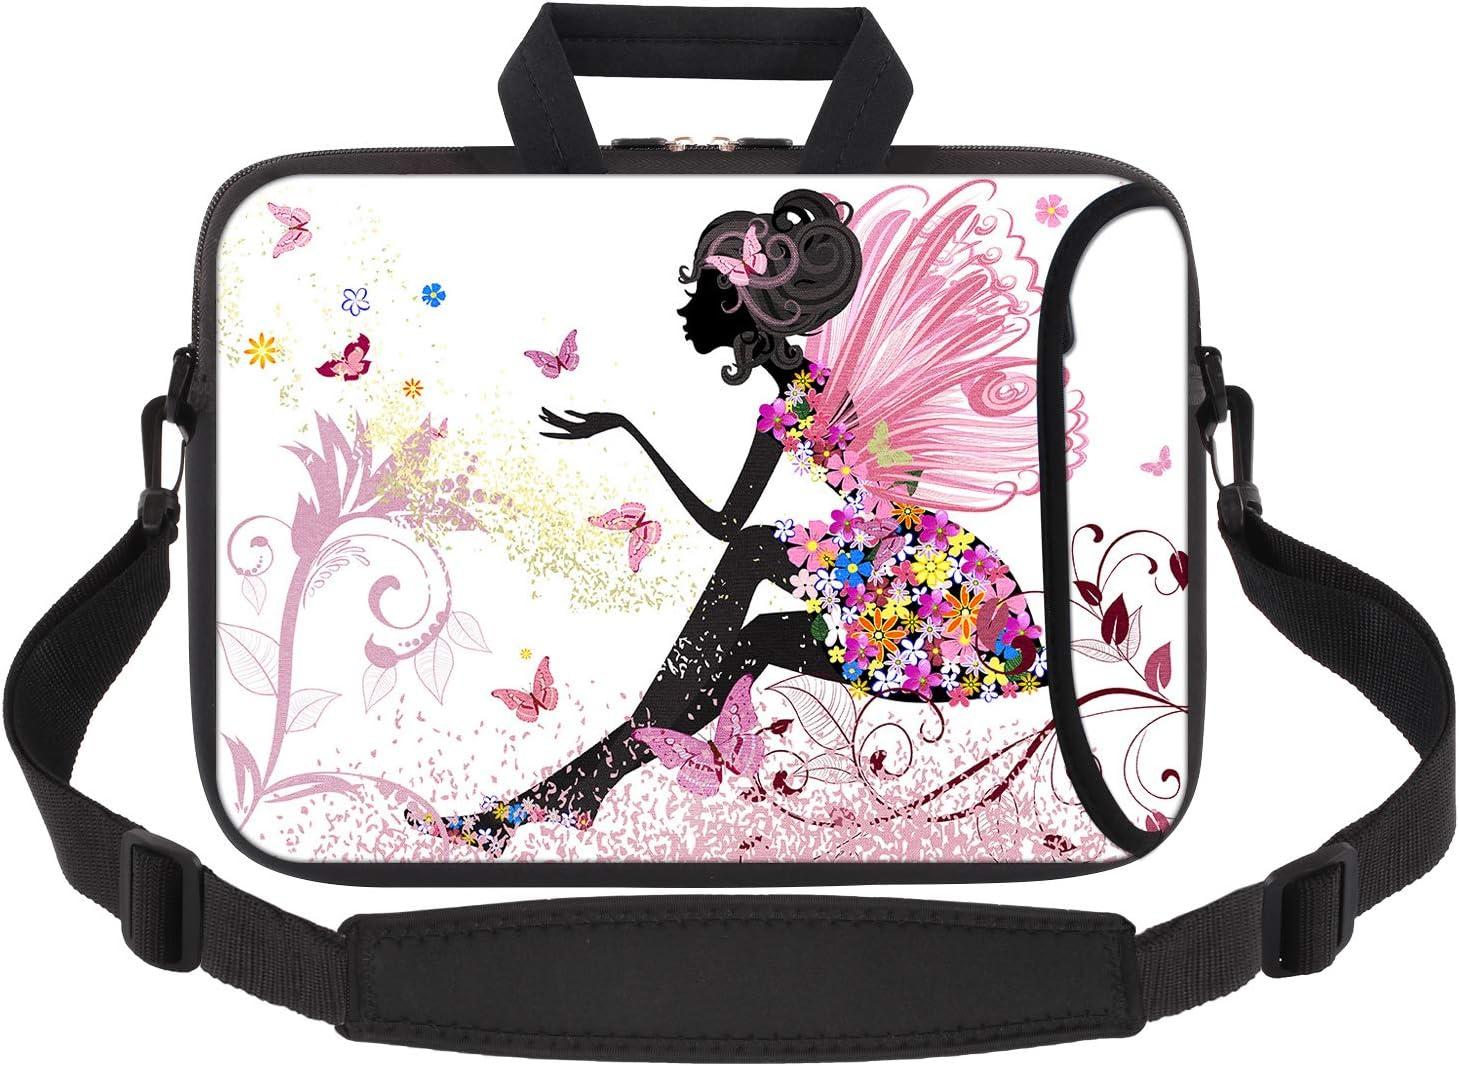 iCasso Laptop Sleeve 11.6-12.1 Inch Stylish Soft Neoprene Sleeve Case Cover Handbag for MacBook Air 11,MacBook Retina 12 Inch/iPad Pro/Ultrabook Netbook Tablet (Butterfly Girl)